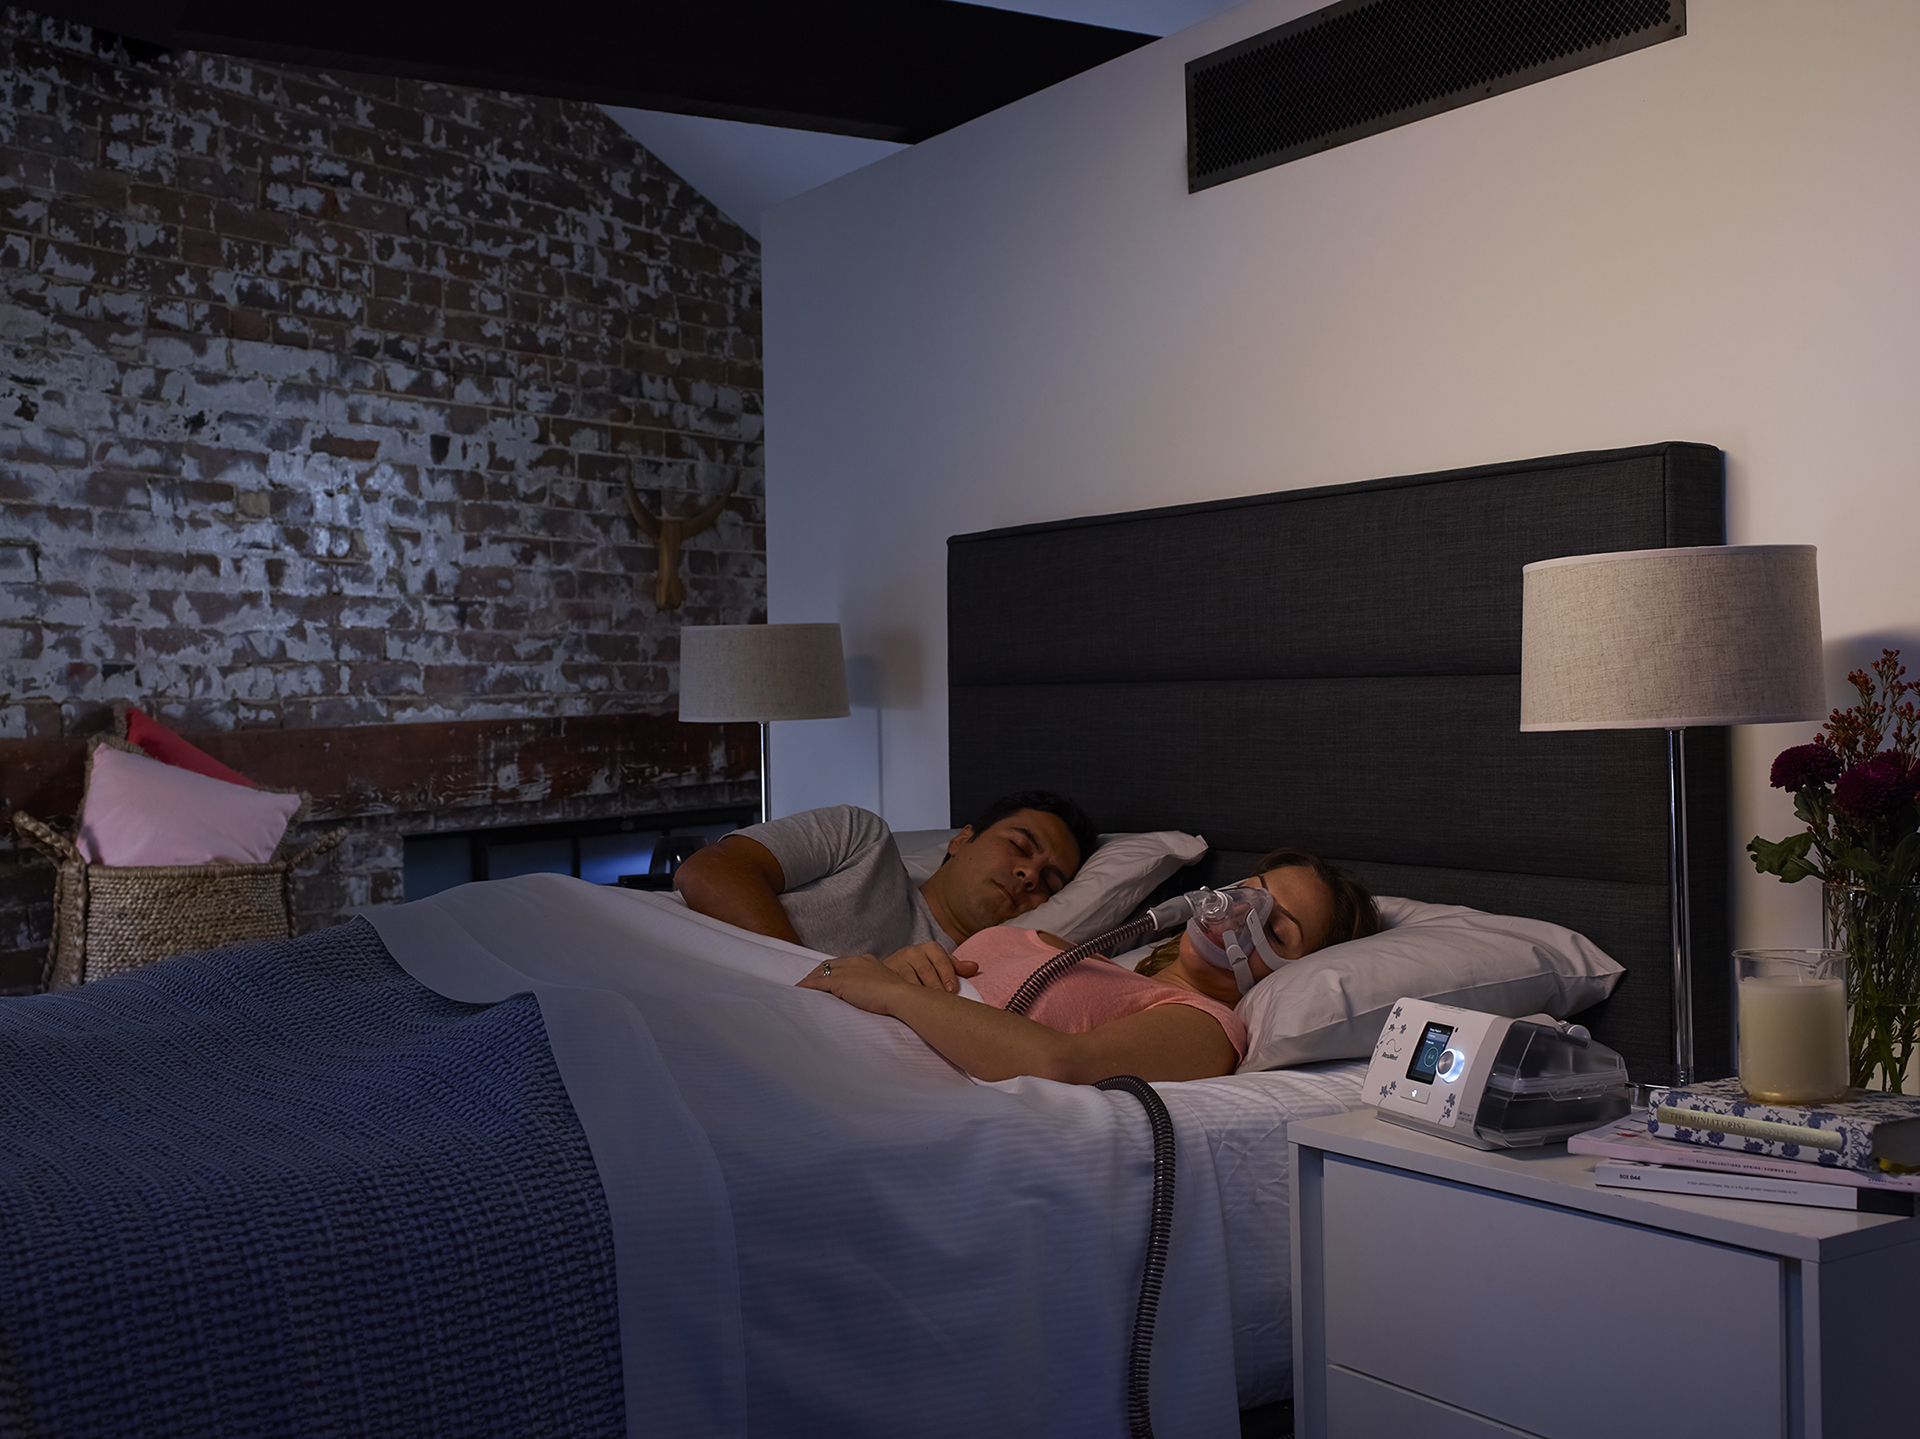 WomanSleeping-AirTouchF20.jpg